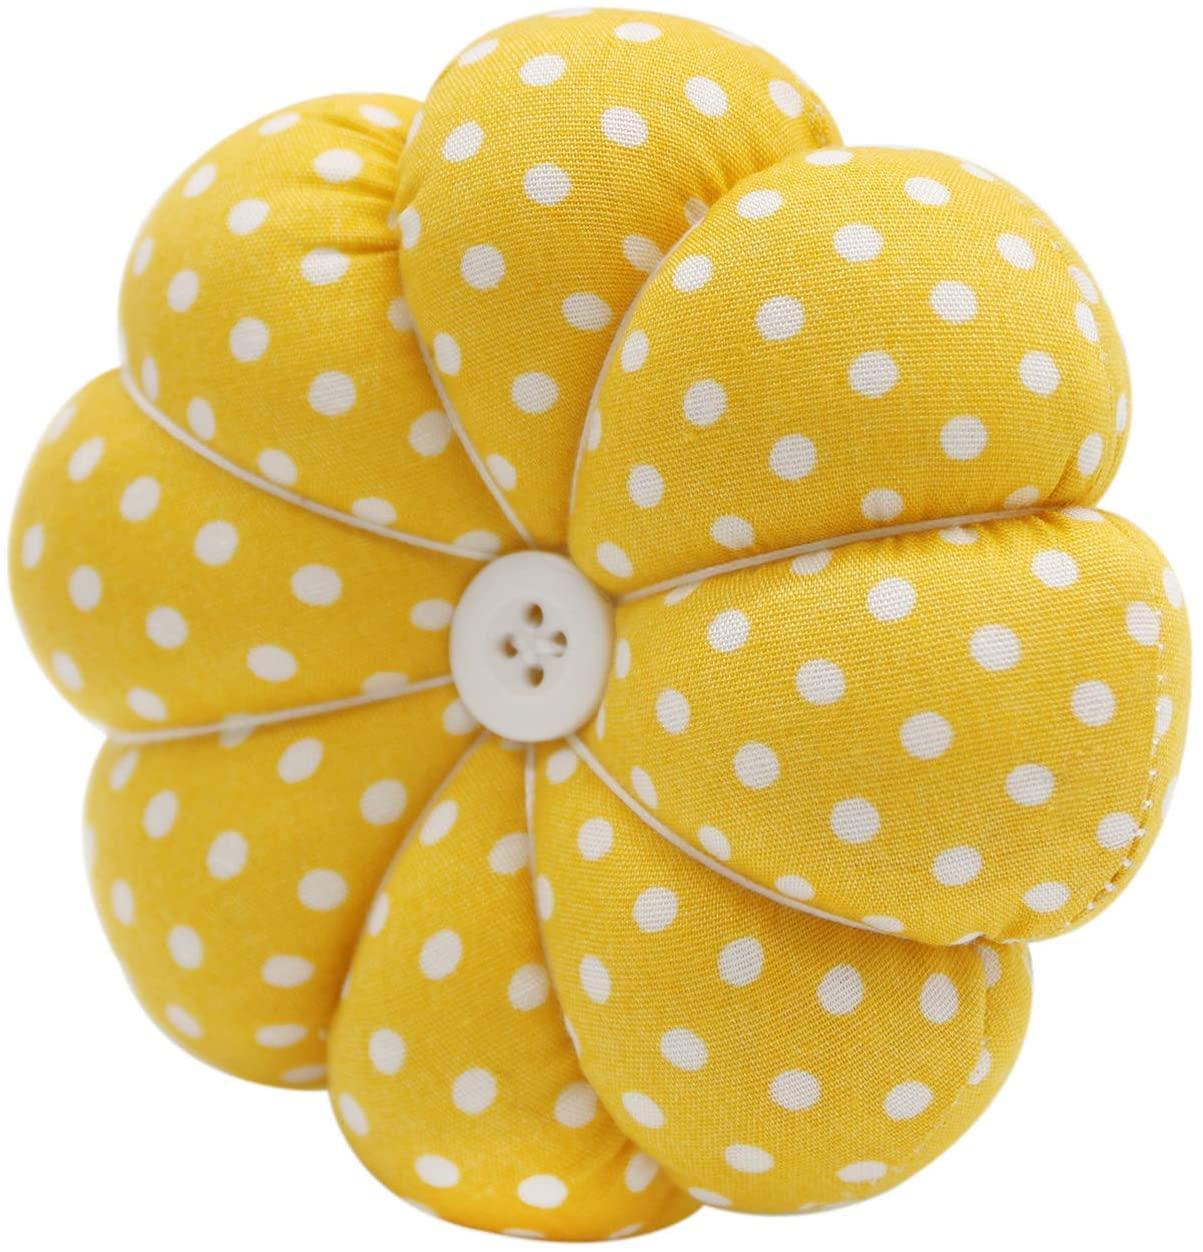 YISTA Wrist Pin Cushion Wearable Pumpkin Sewing Pin Cushions for Needlework (Yellow)